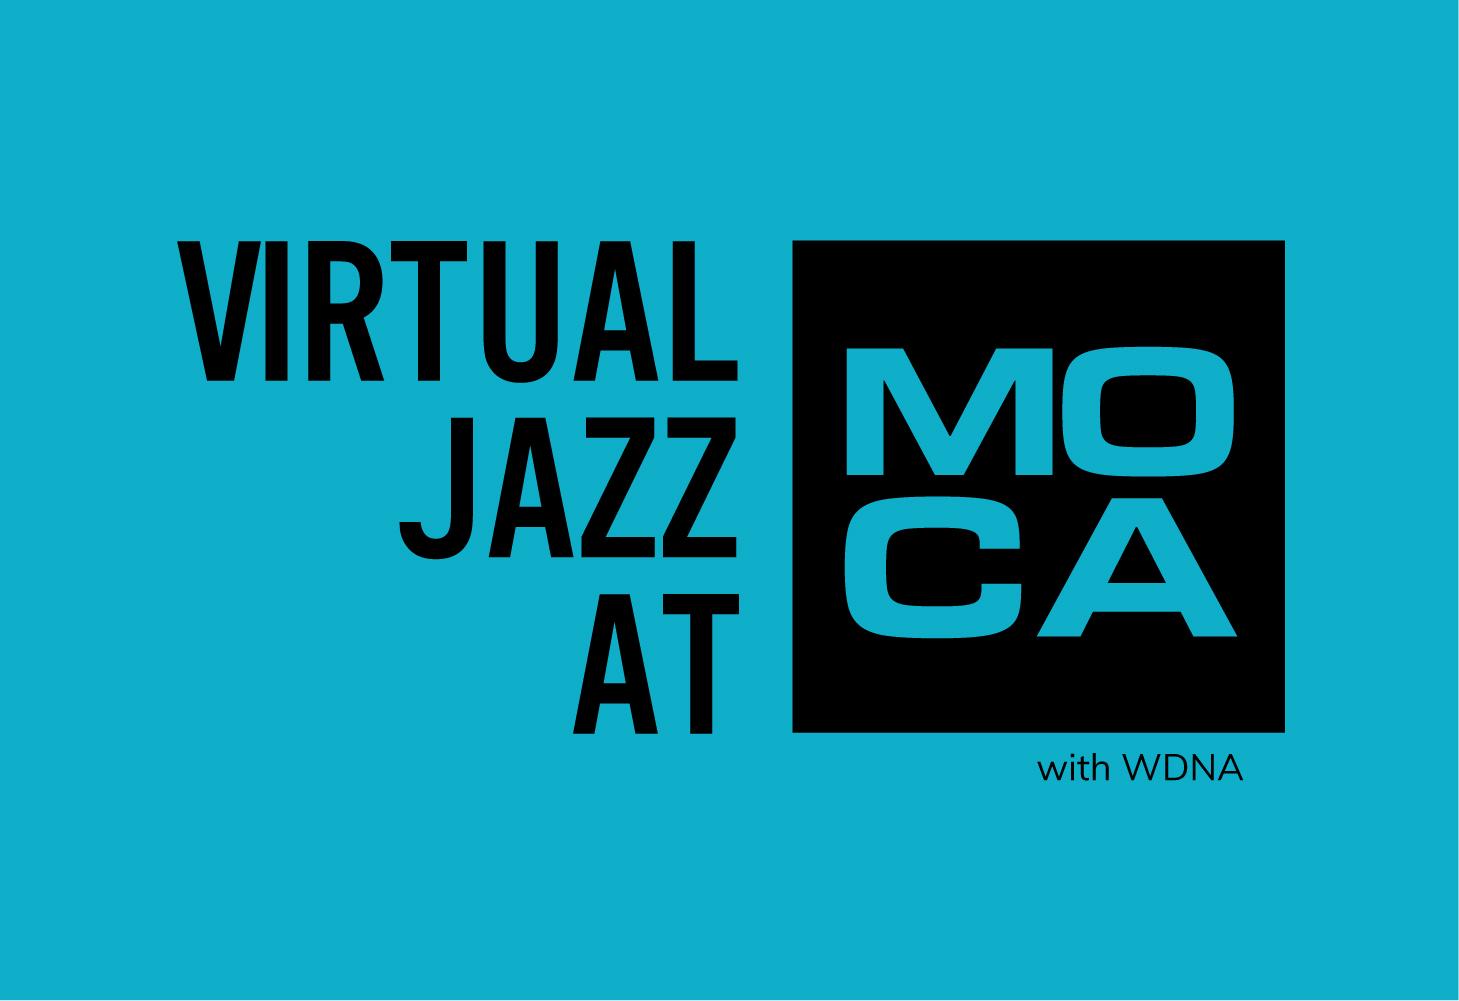 Jazz at mocarelaunches